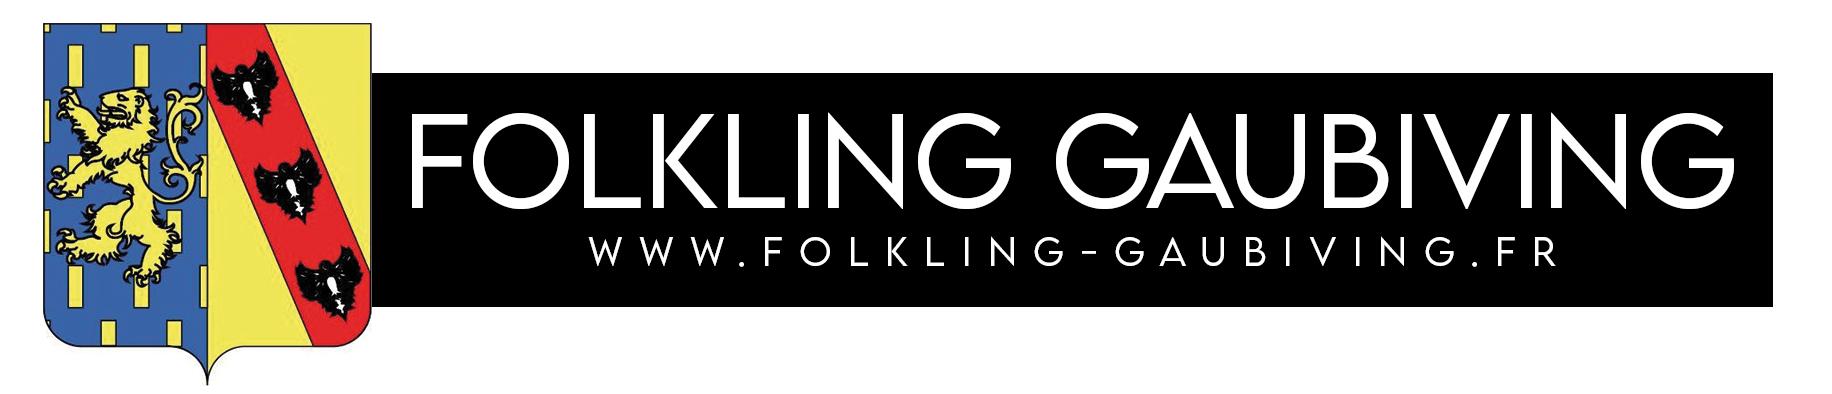 Folkling  Gaubiving